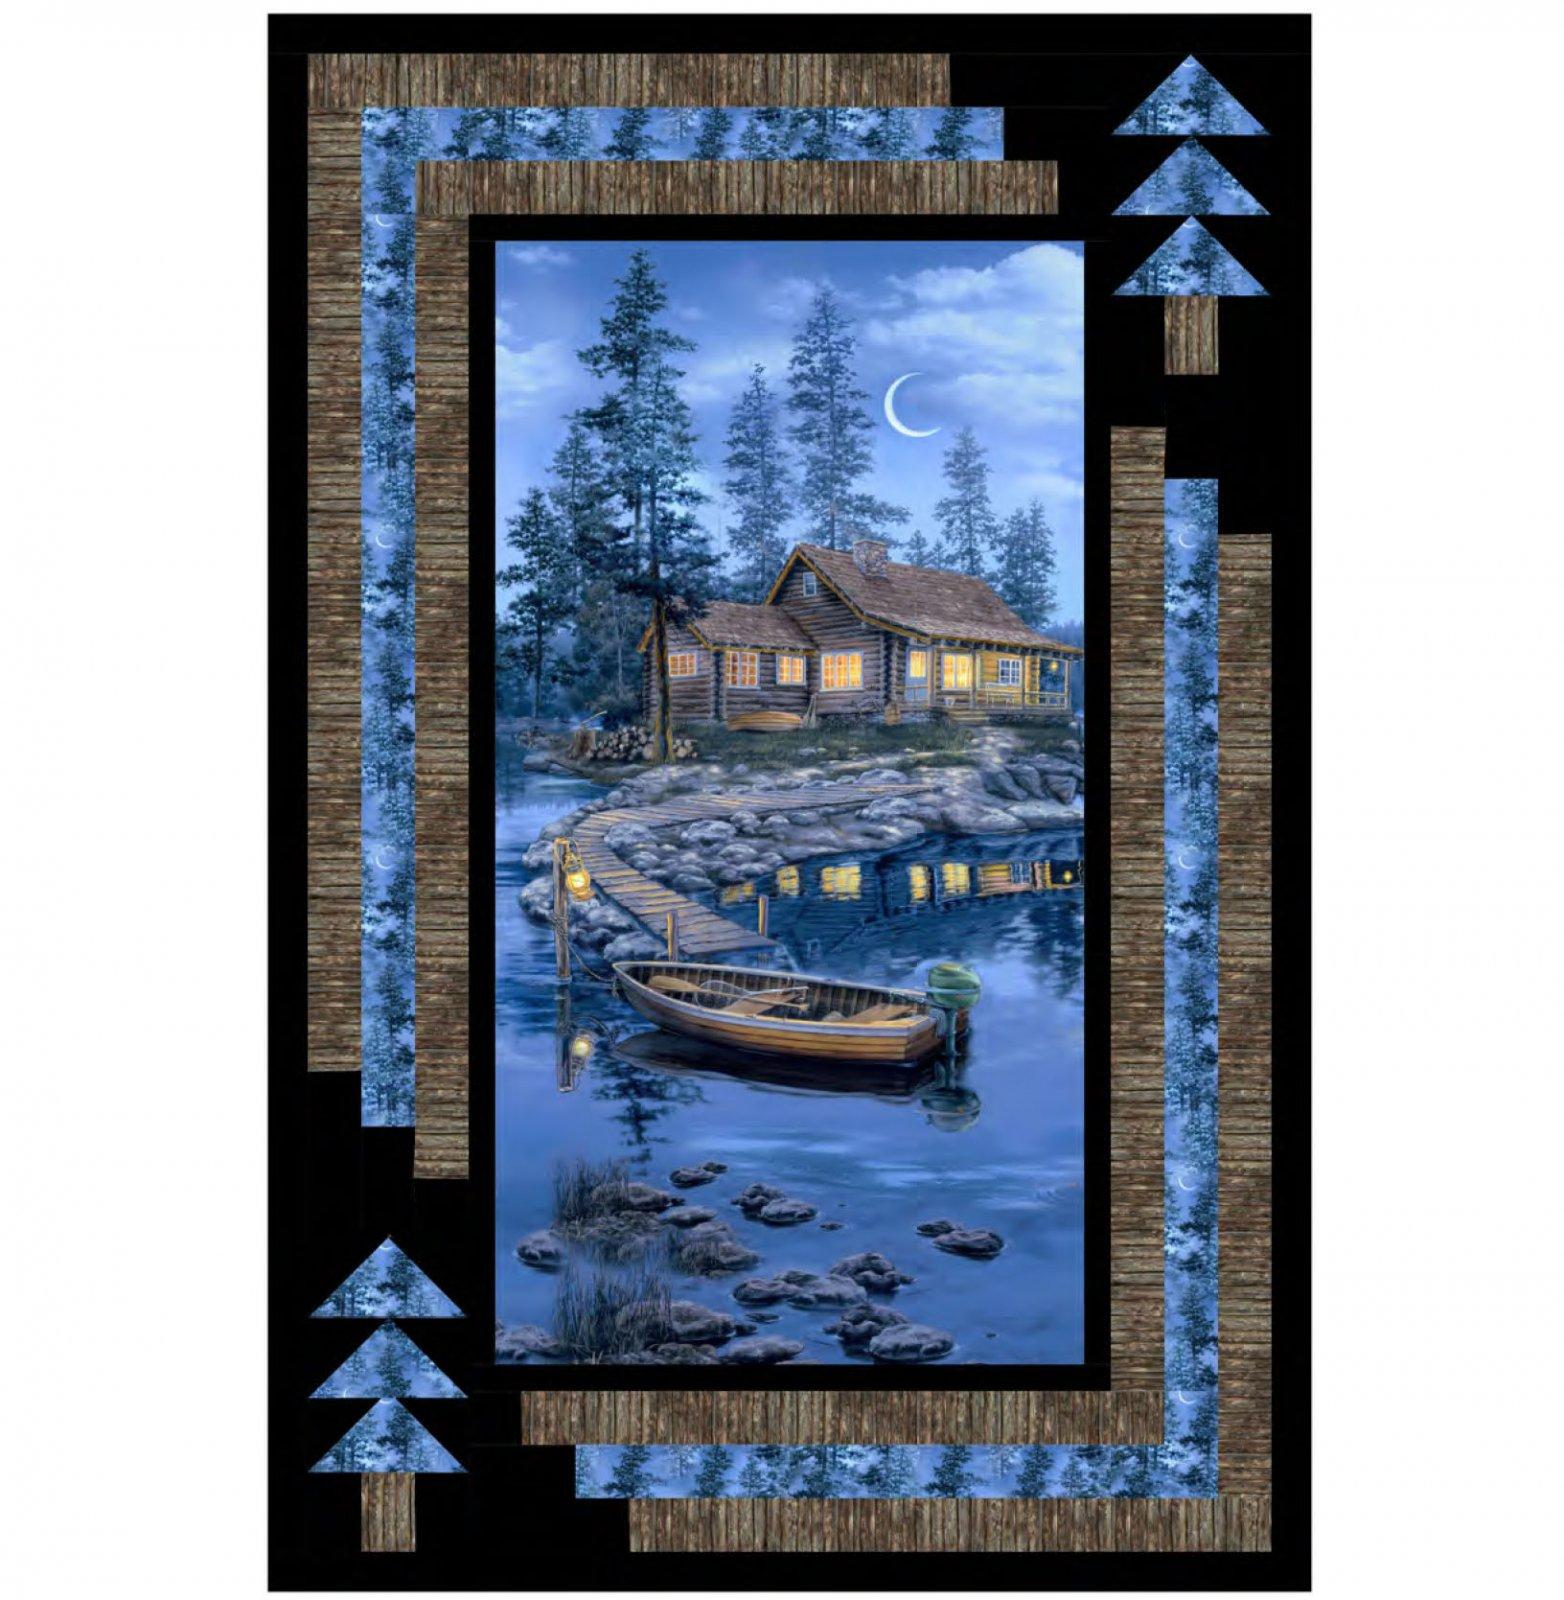 Lakeside Retreat Kit with Lakeside Cabin by Darrell Bush